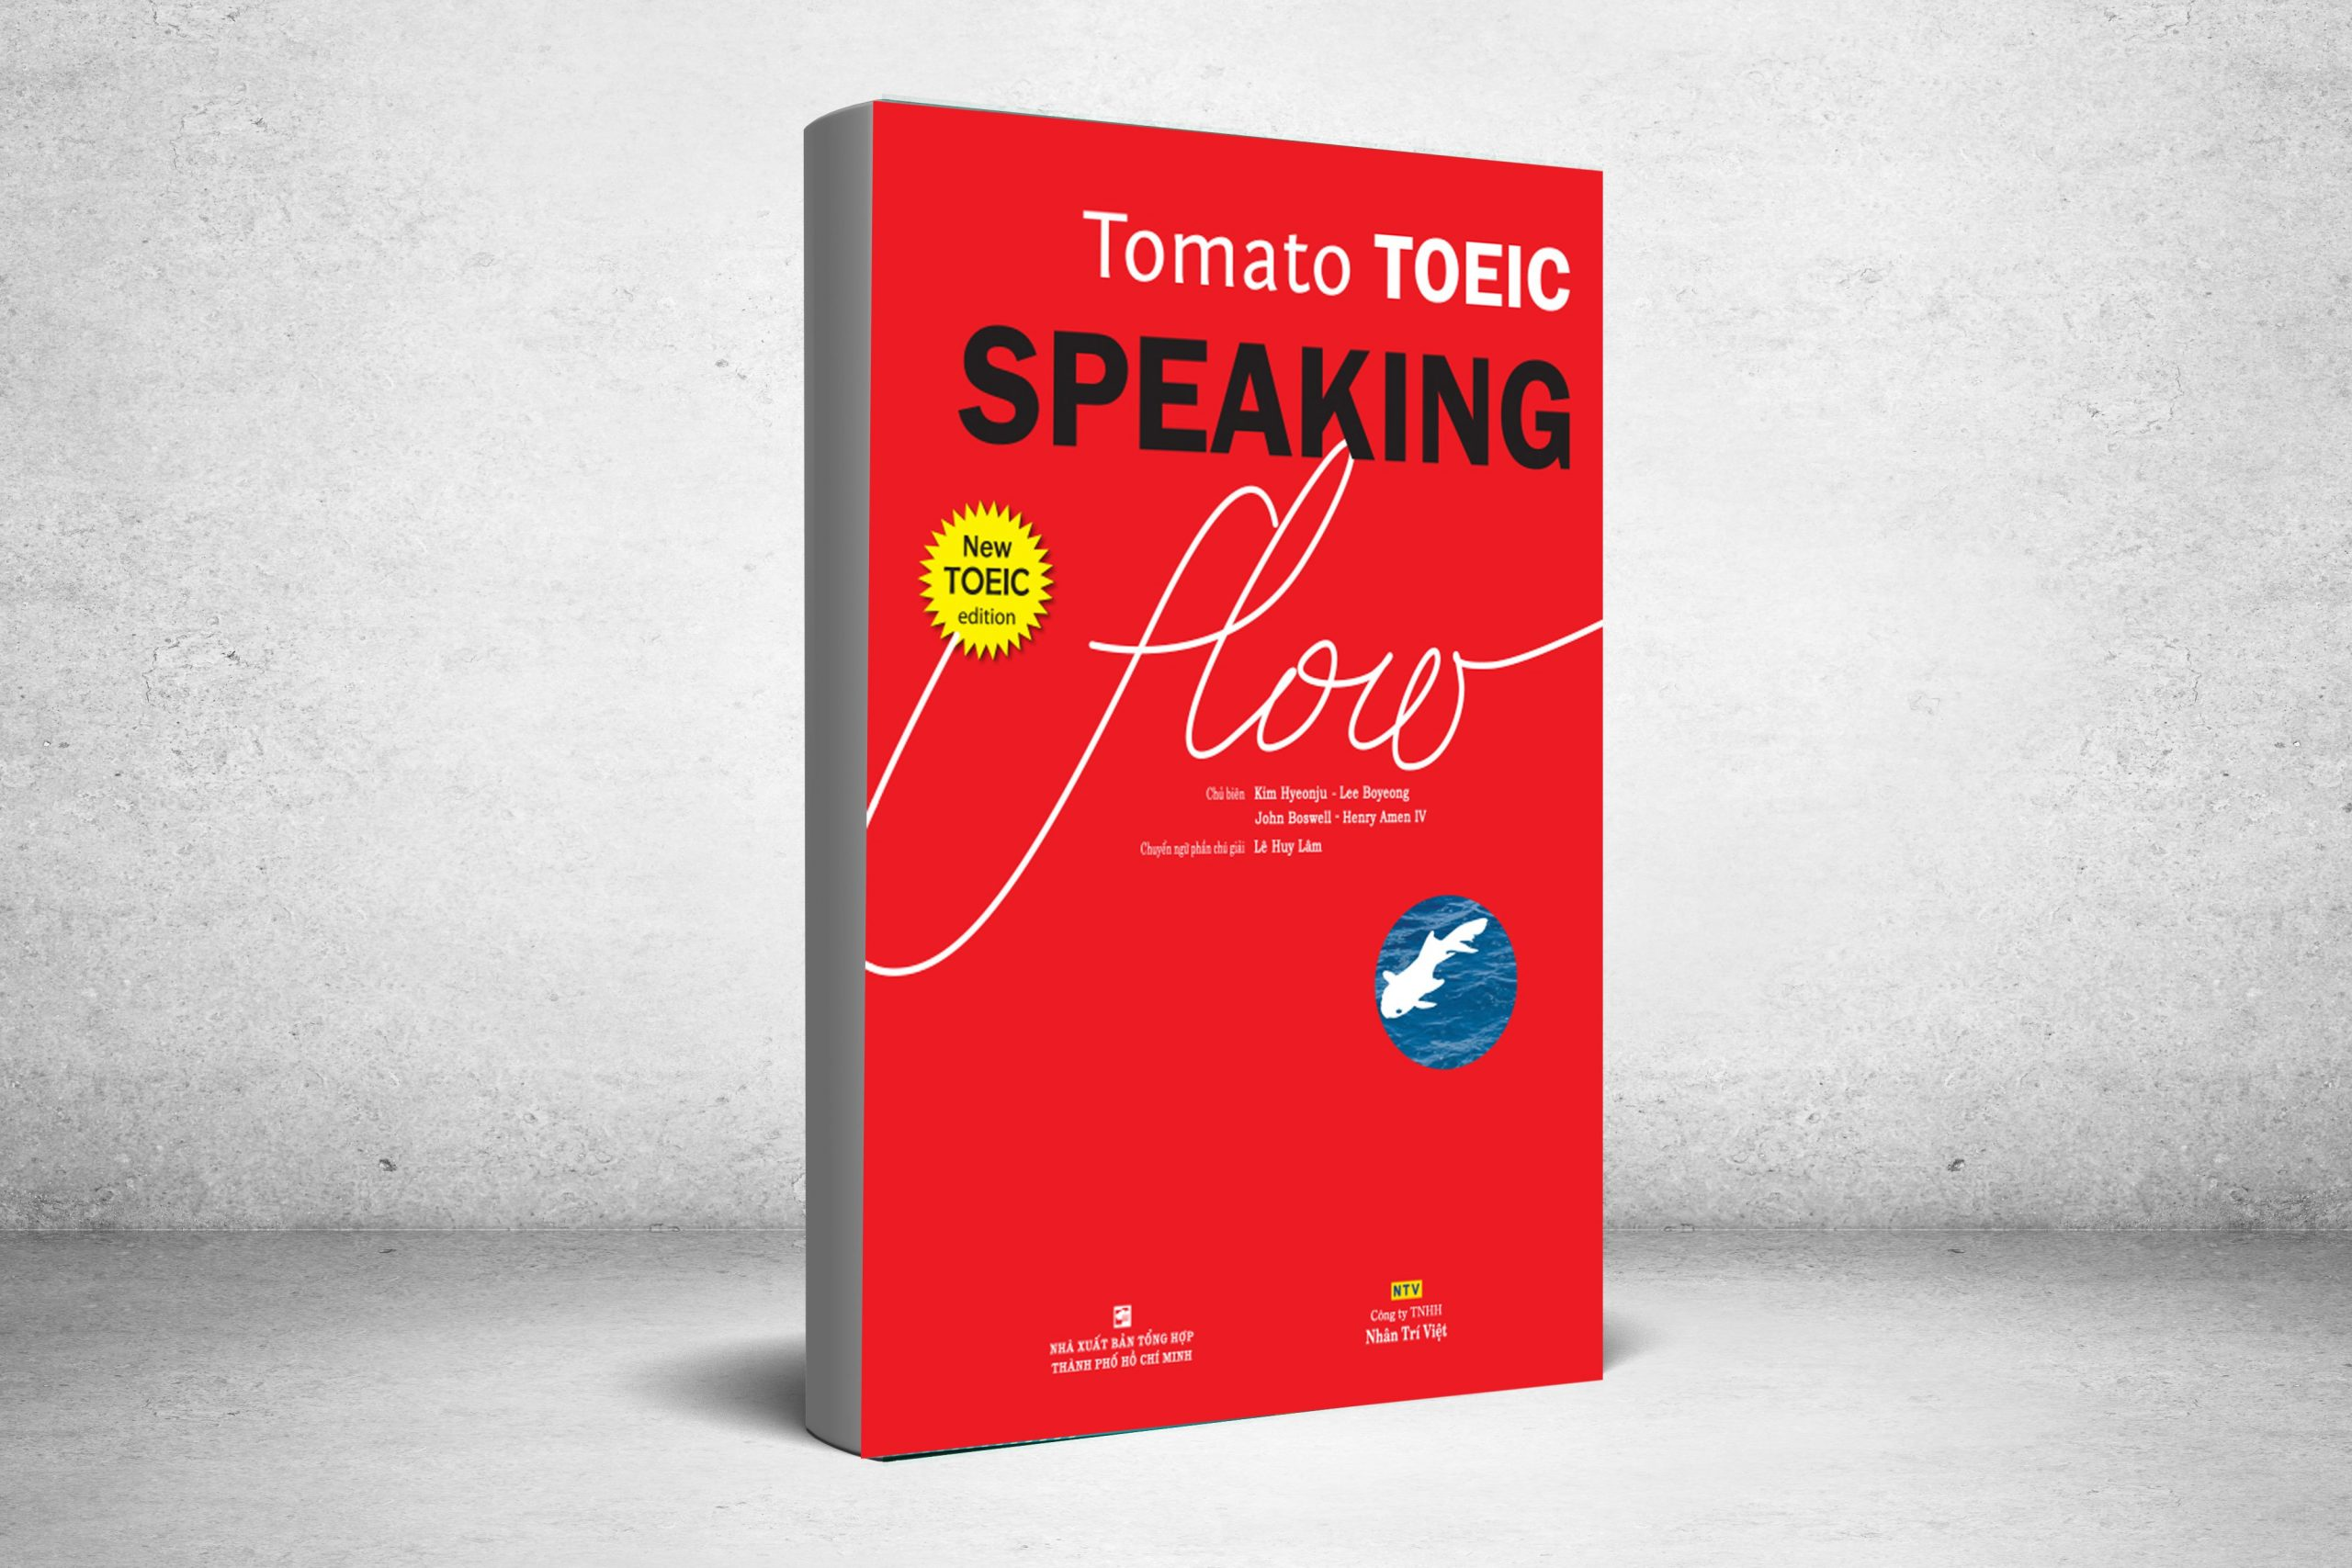 tomato toeic